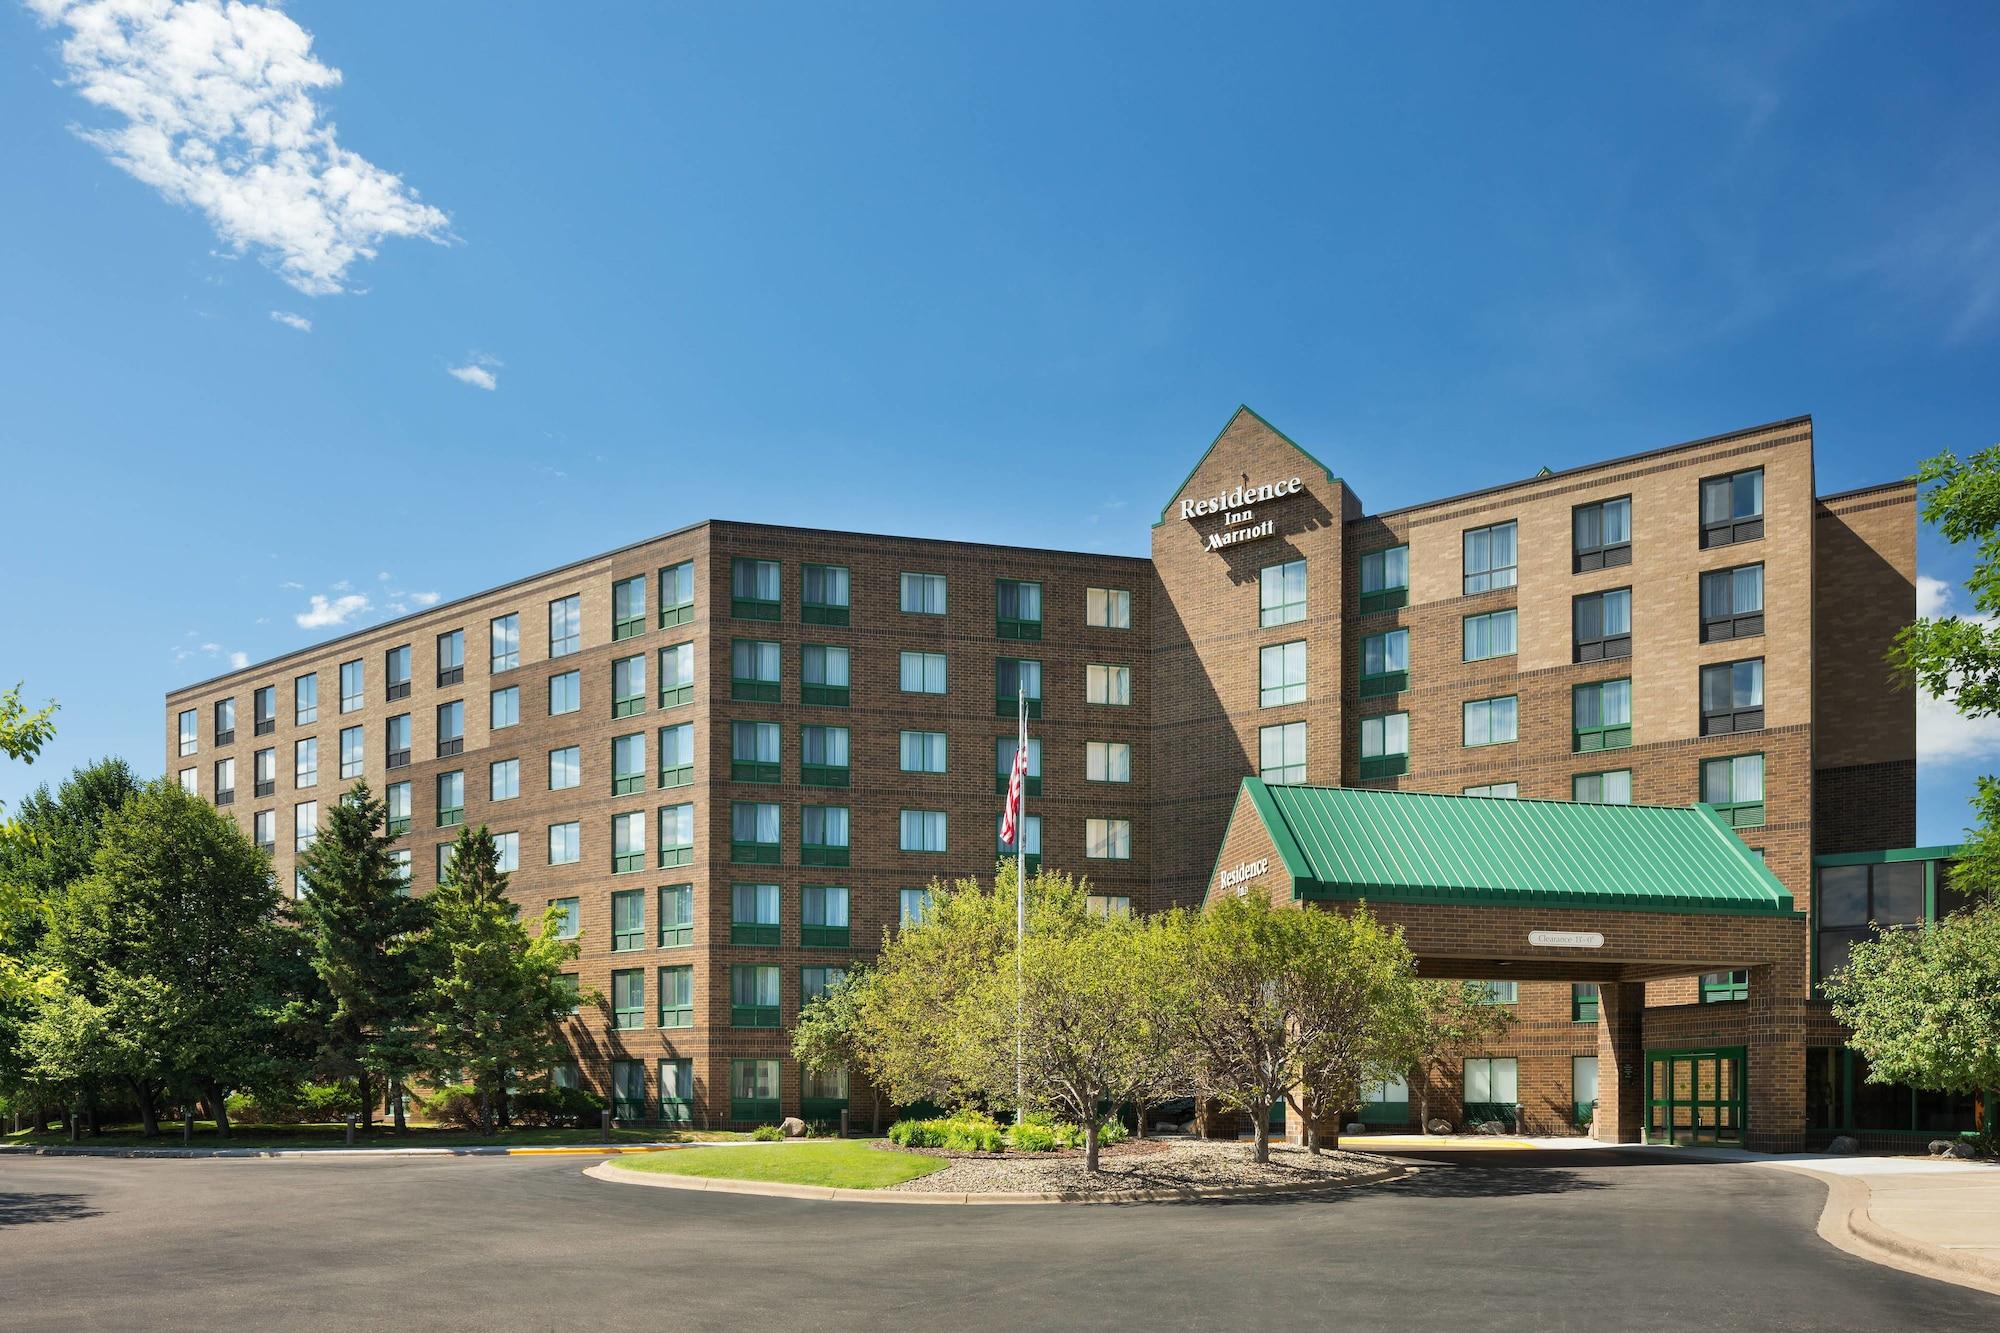 Residence Inn by Marriott Minneapolis Edina, Hennepin